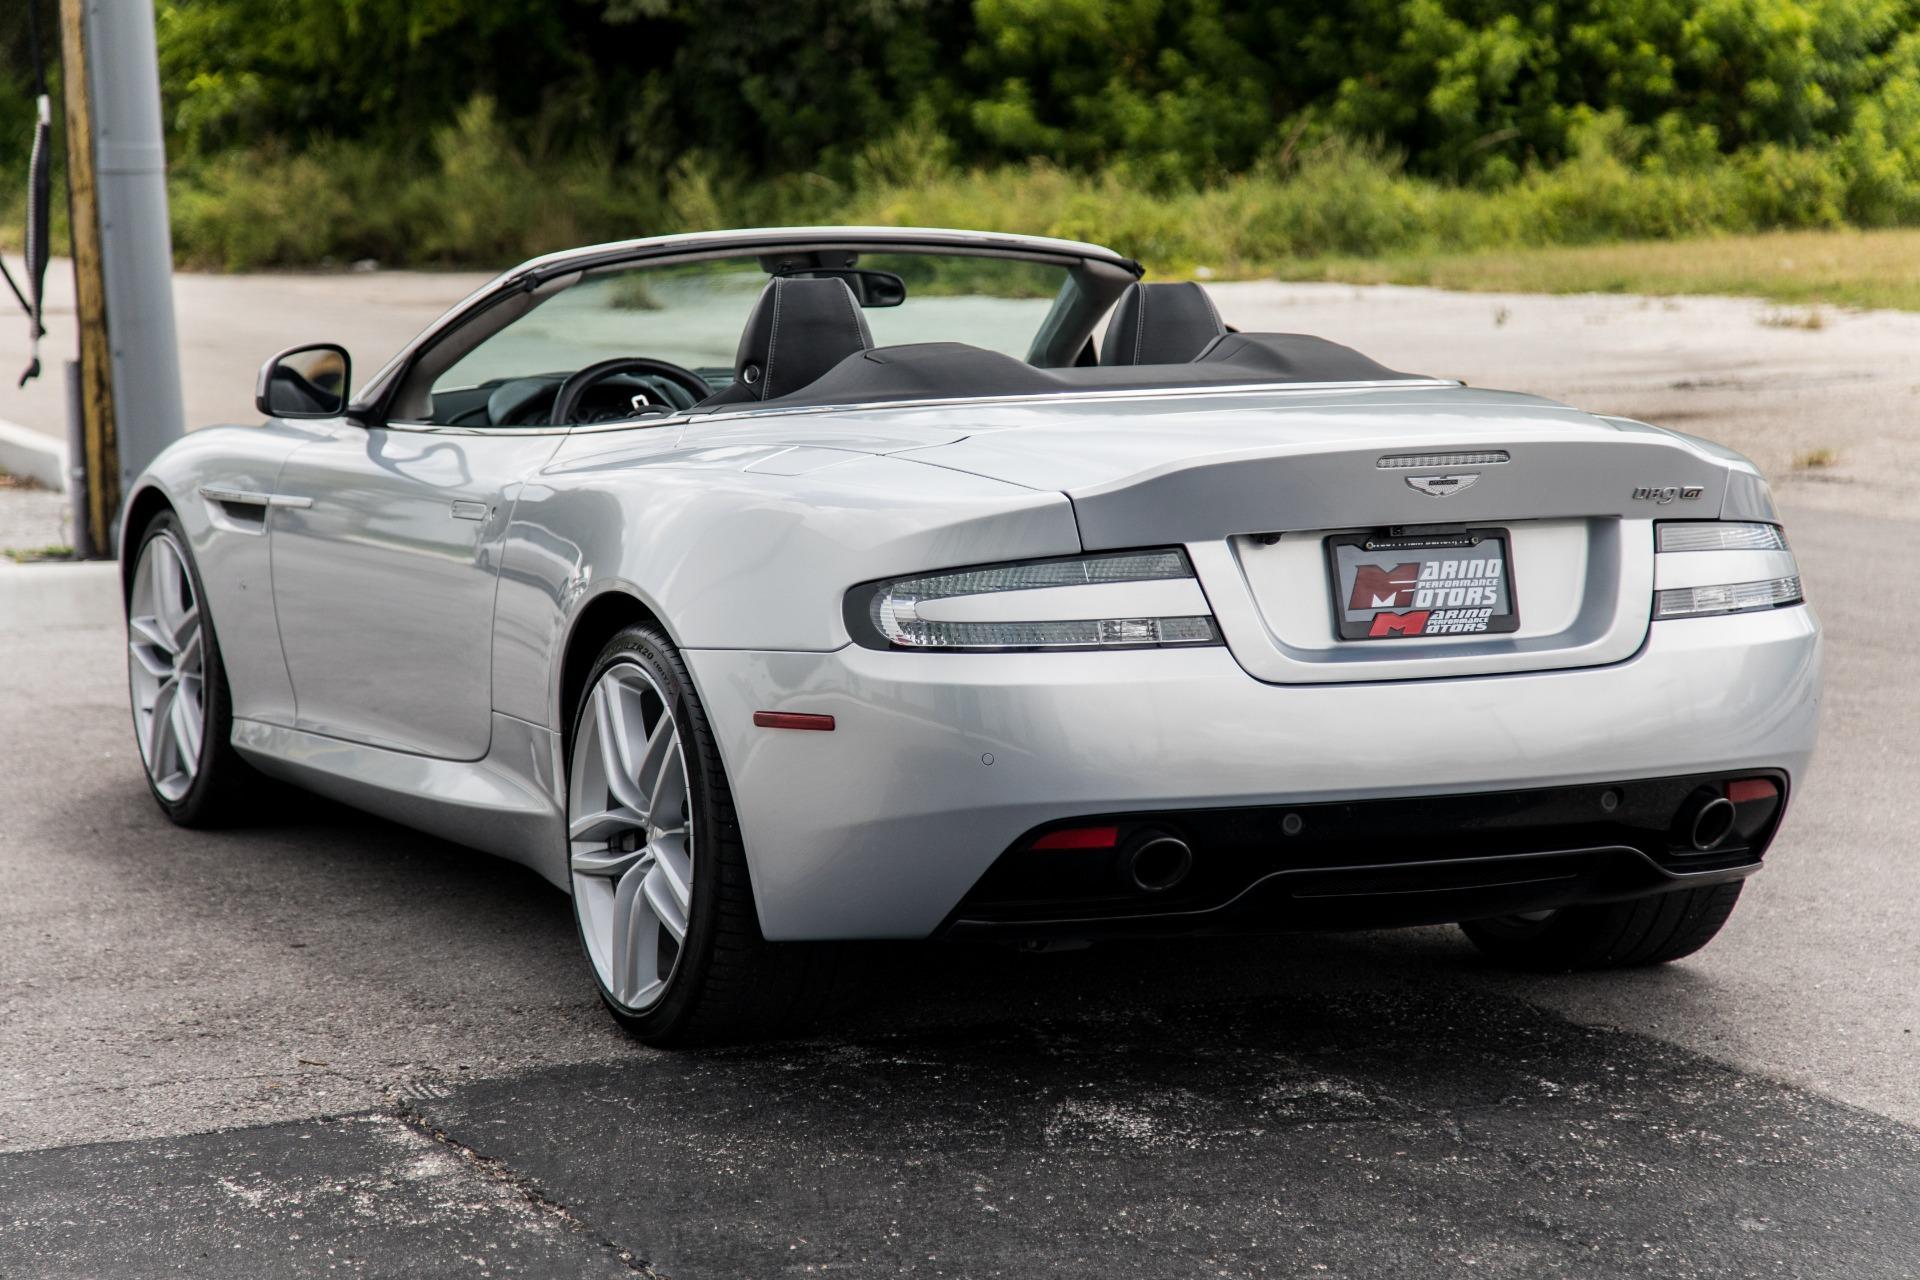 Used-2016-Aston-Martin-DB9-GT-Volante